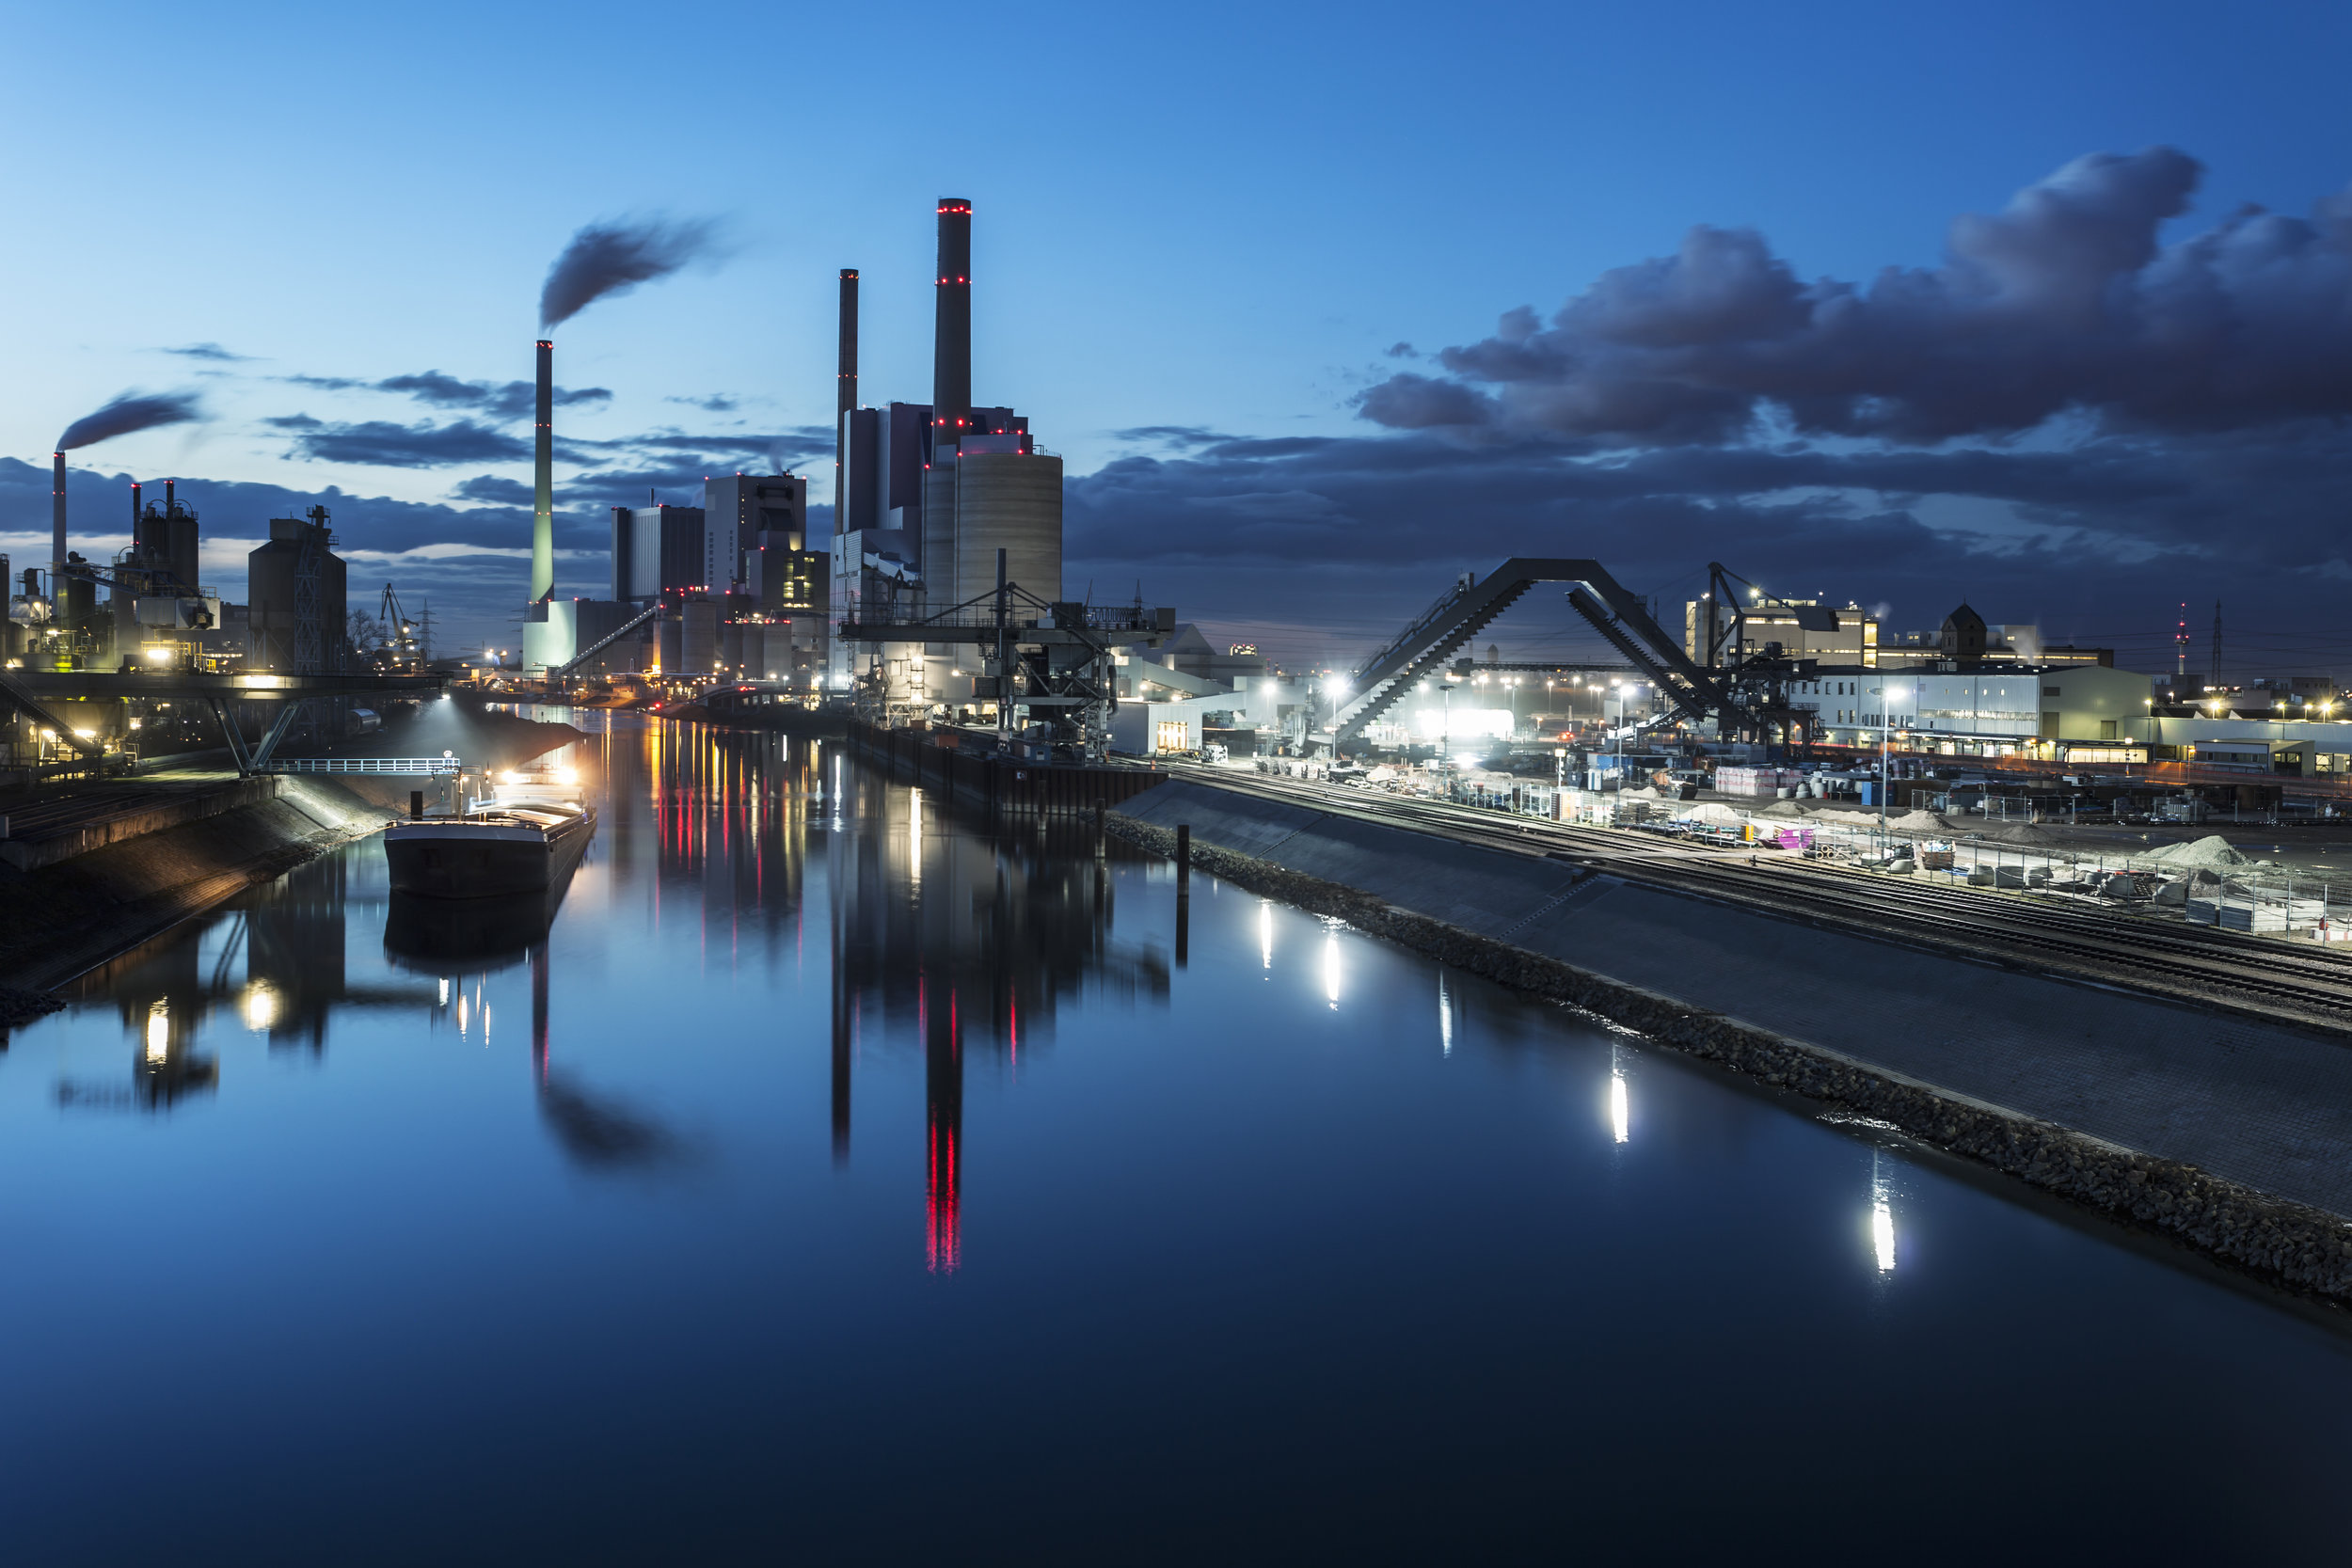 Industrial_Plant_GettyImages-479157539.jpg